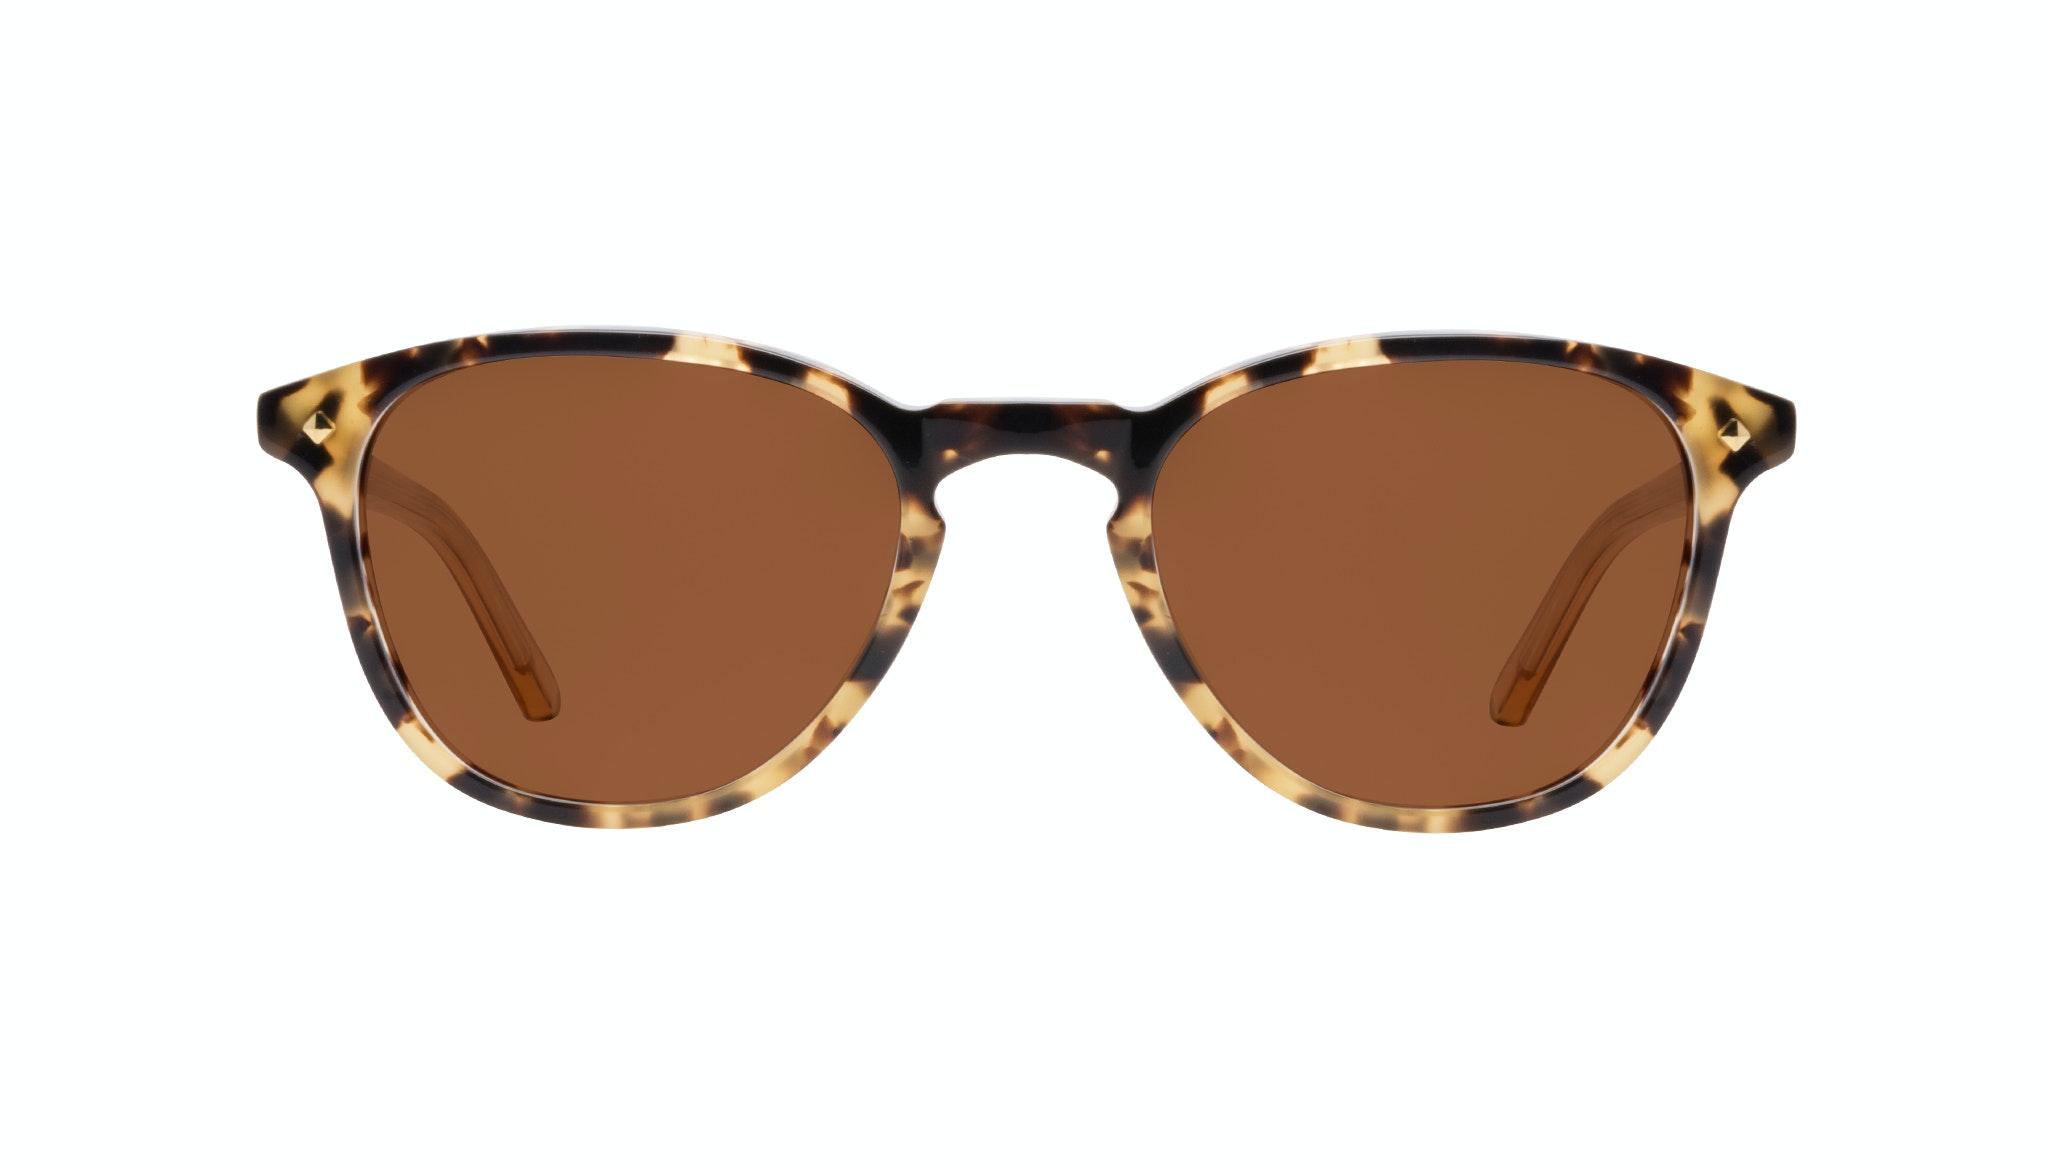 Affordable Fashion Glasses Round Sunglasses Women Crush Bingal